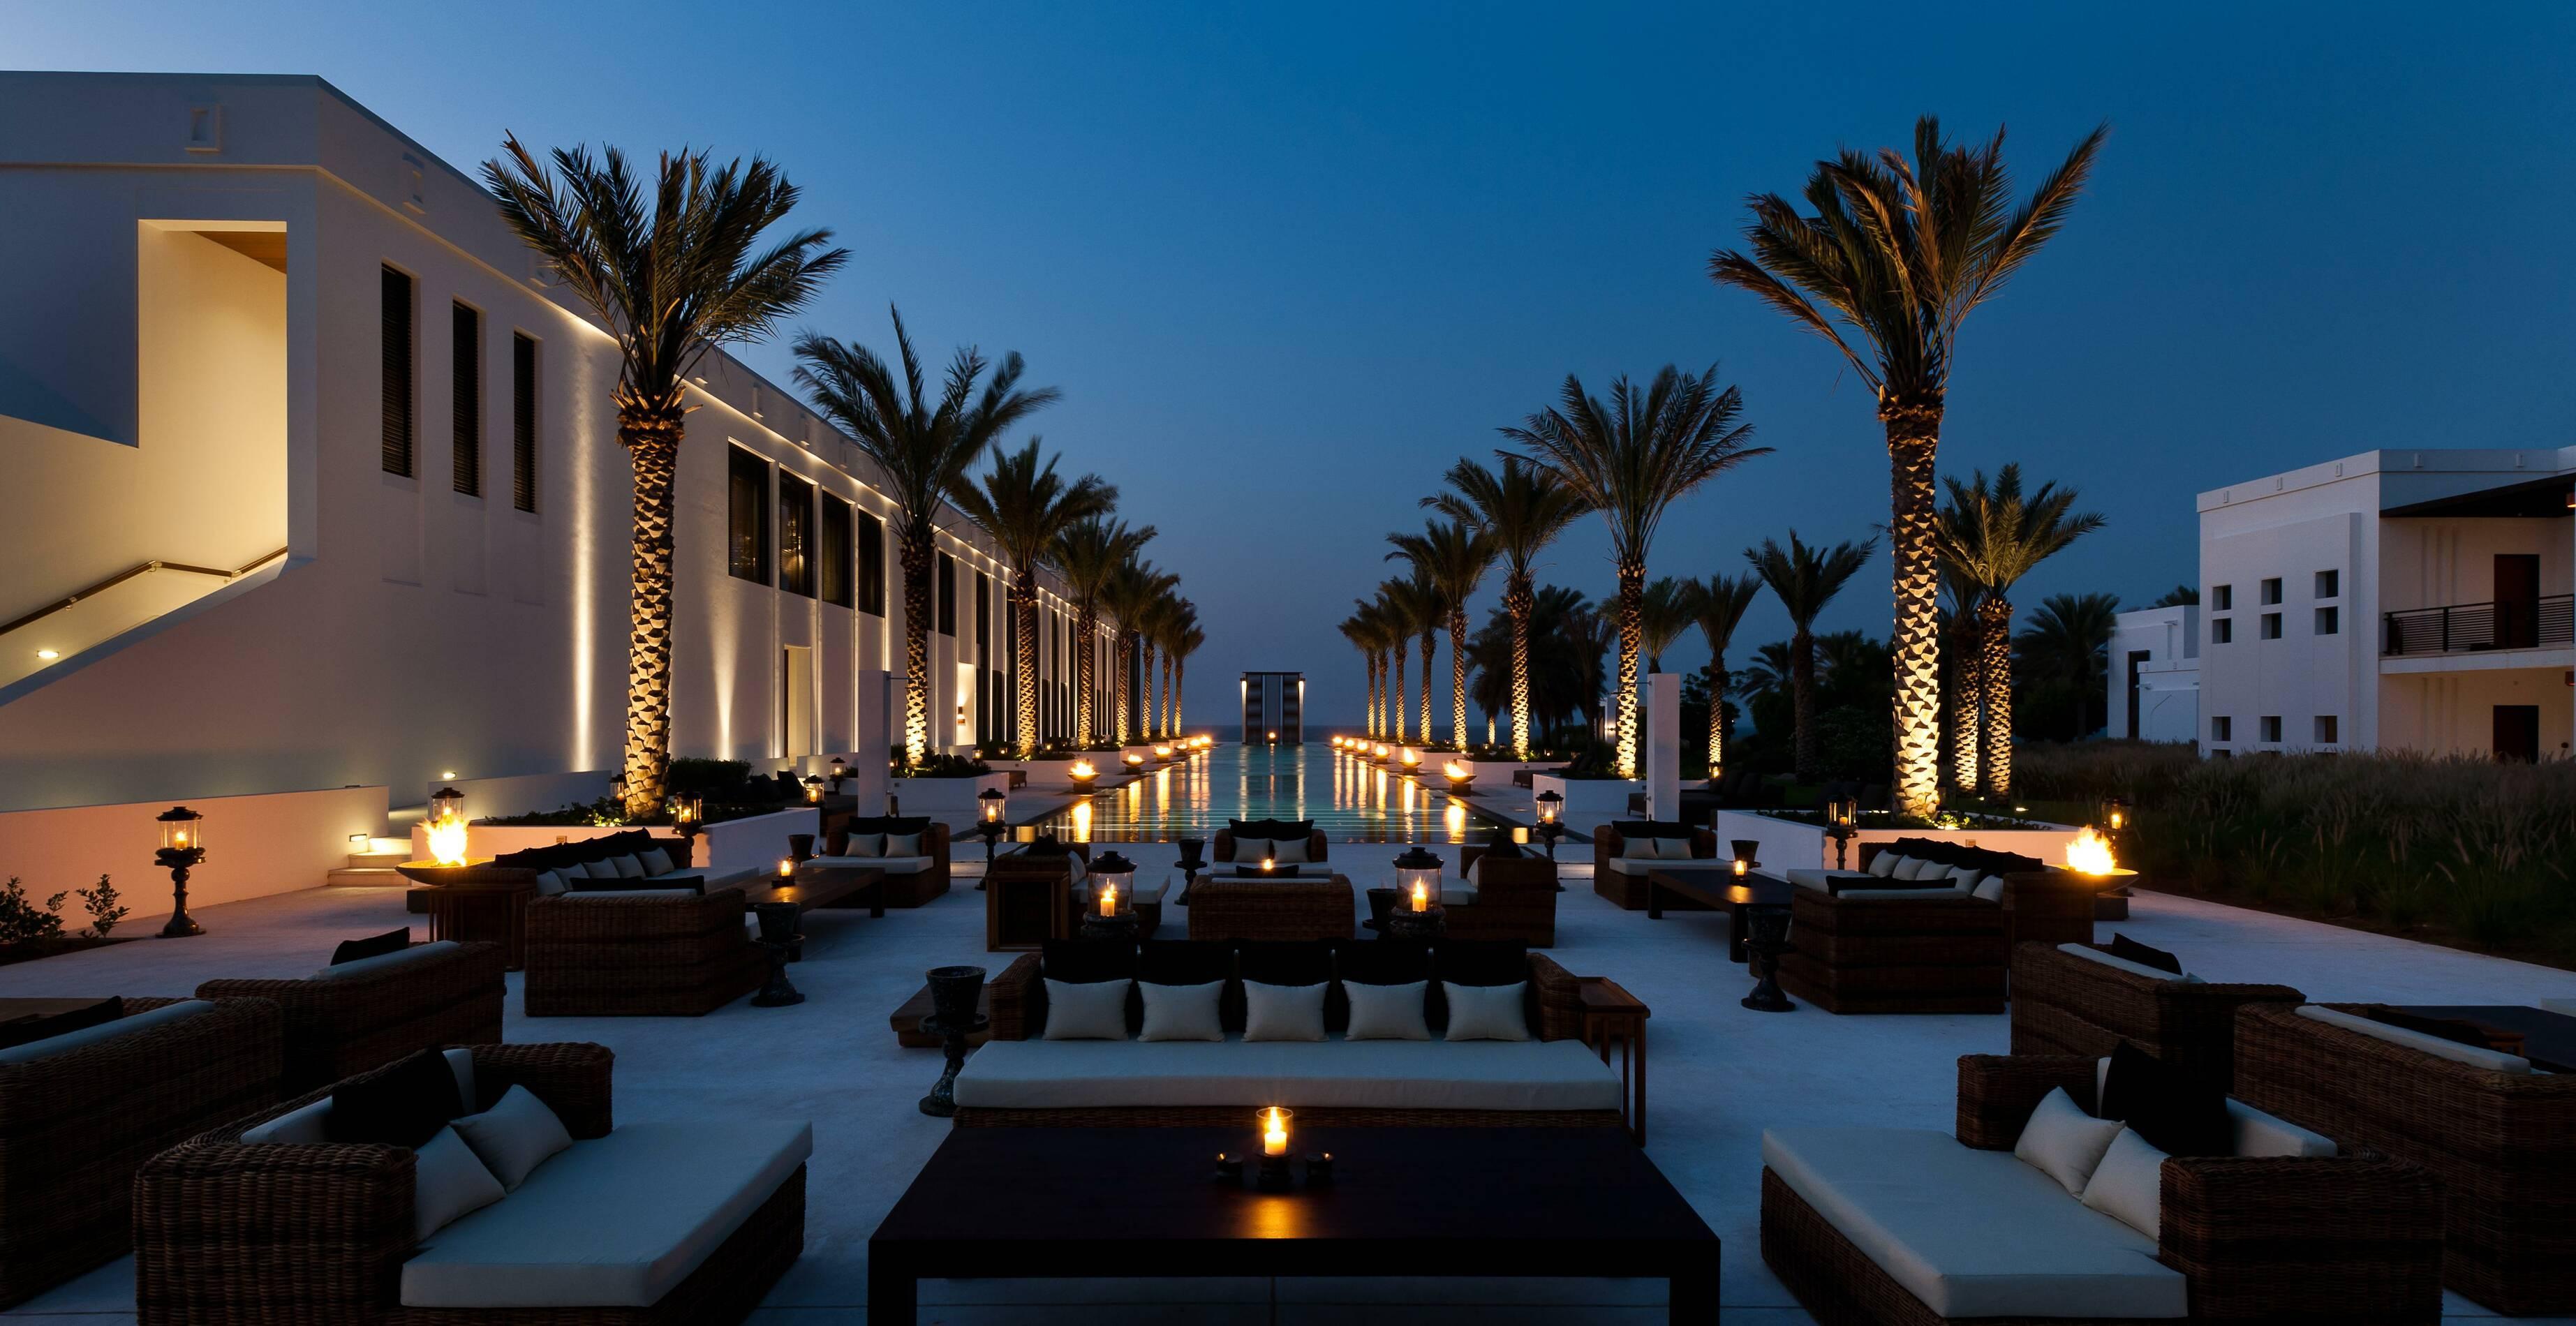 Chedi Muscat Oman Piscine Nuit